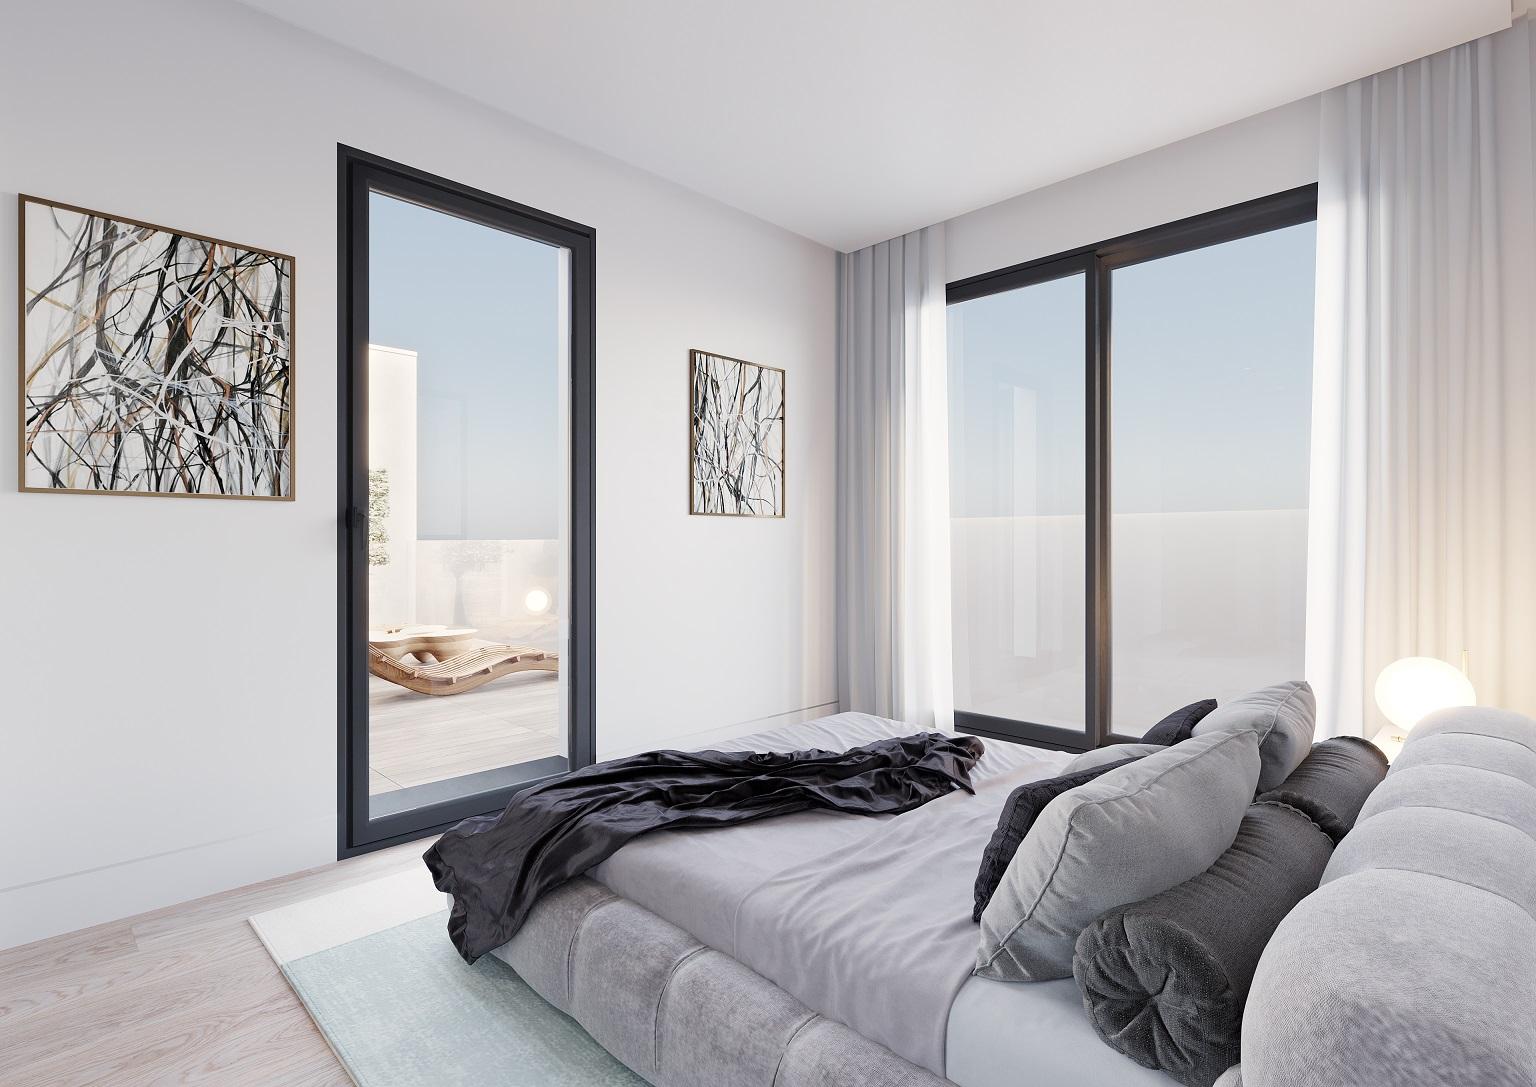 beluga_rueda_6A_dormitorio_60